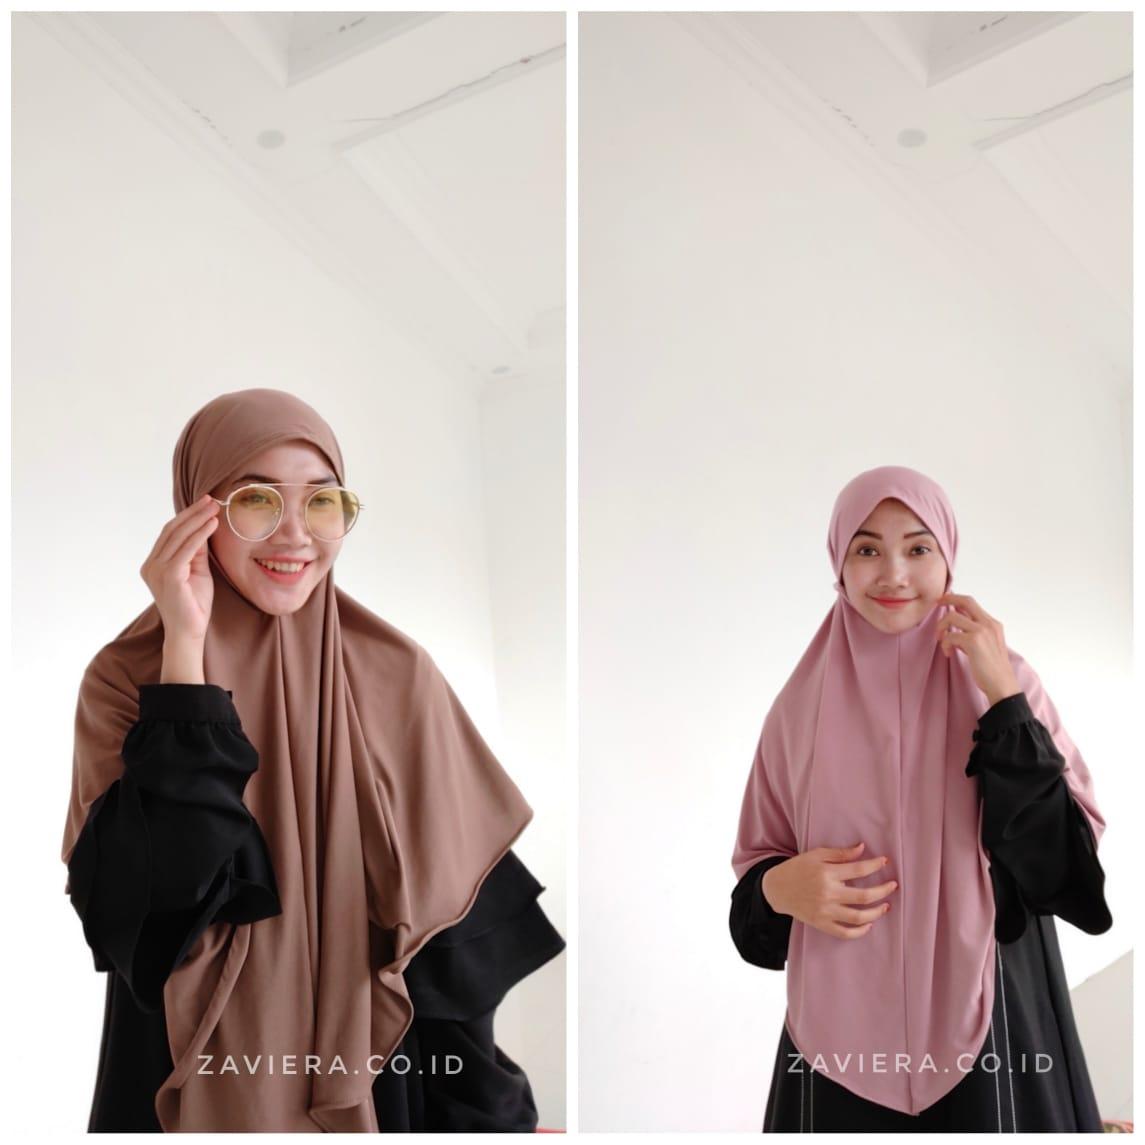 Jilbab Instan Bergo Maryam Tali Bahan Jersey Kerudung Instan Tali Maryam 2020 Bergo Hijab Instan Khimar Bergo Maryam Non Pet Lazada Indonesia